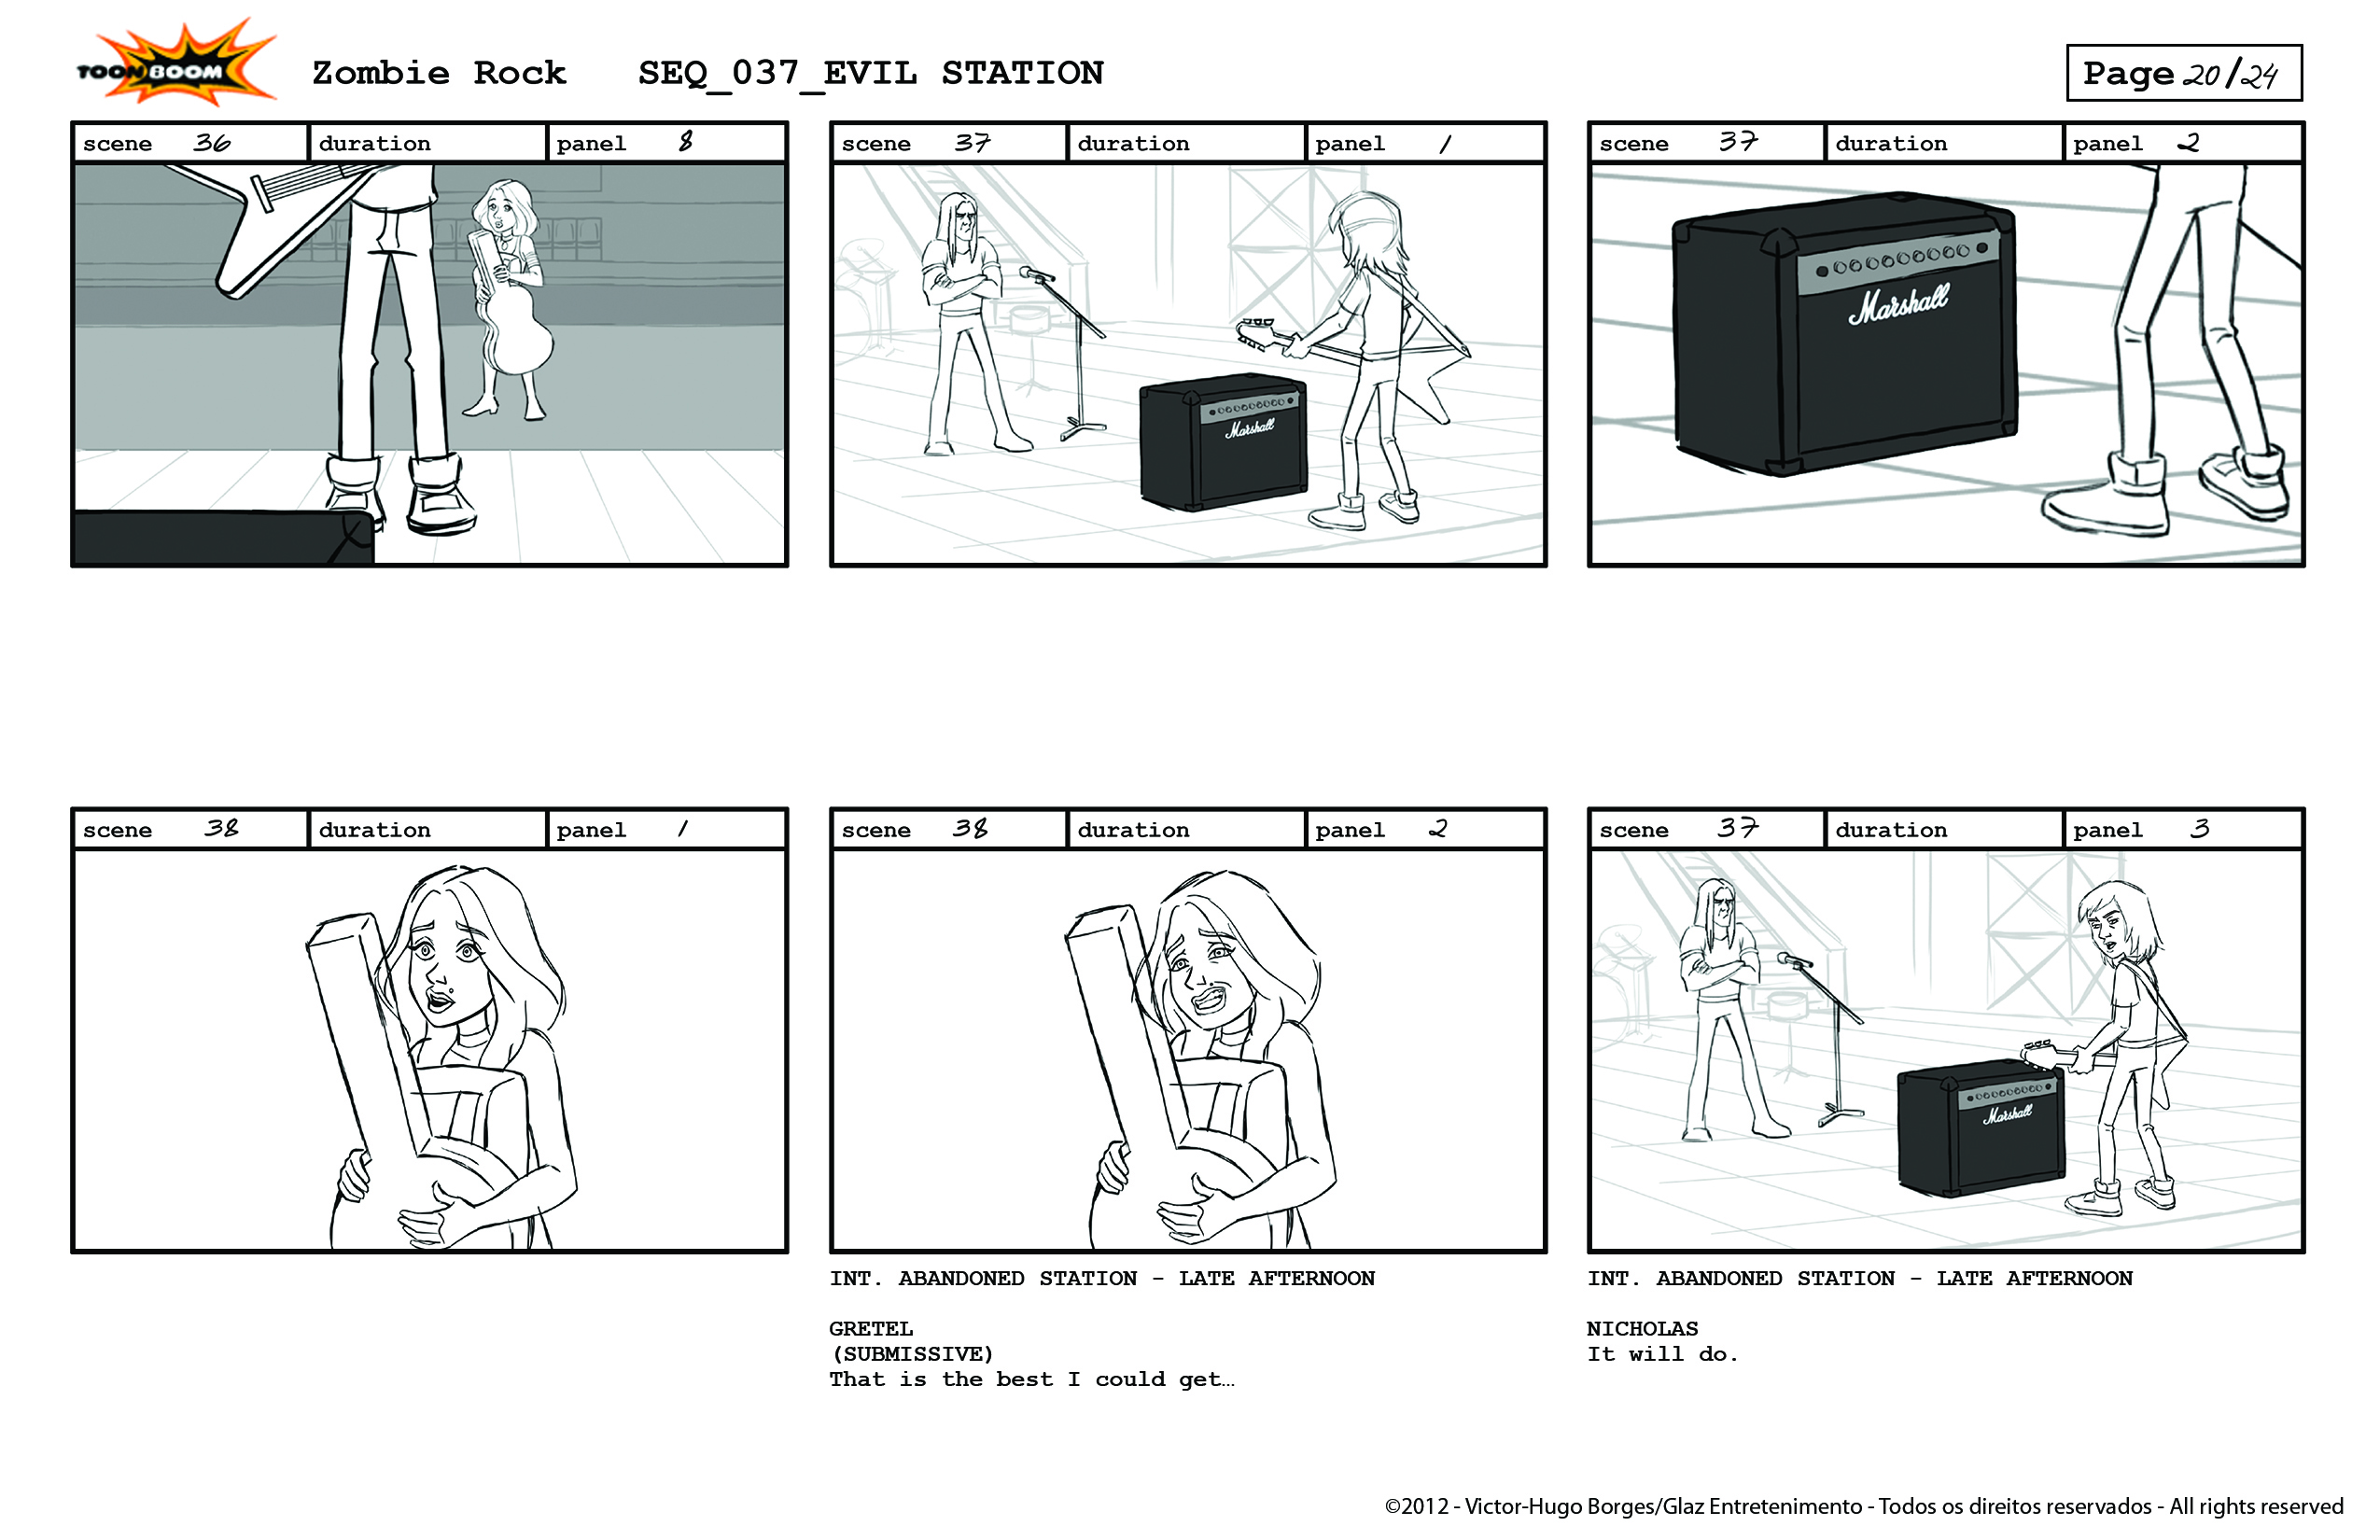 SEQ037_Evil Station_page20